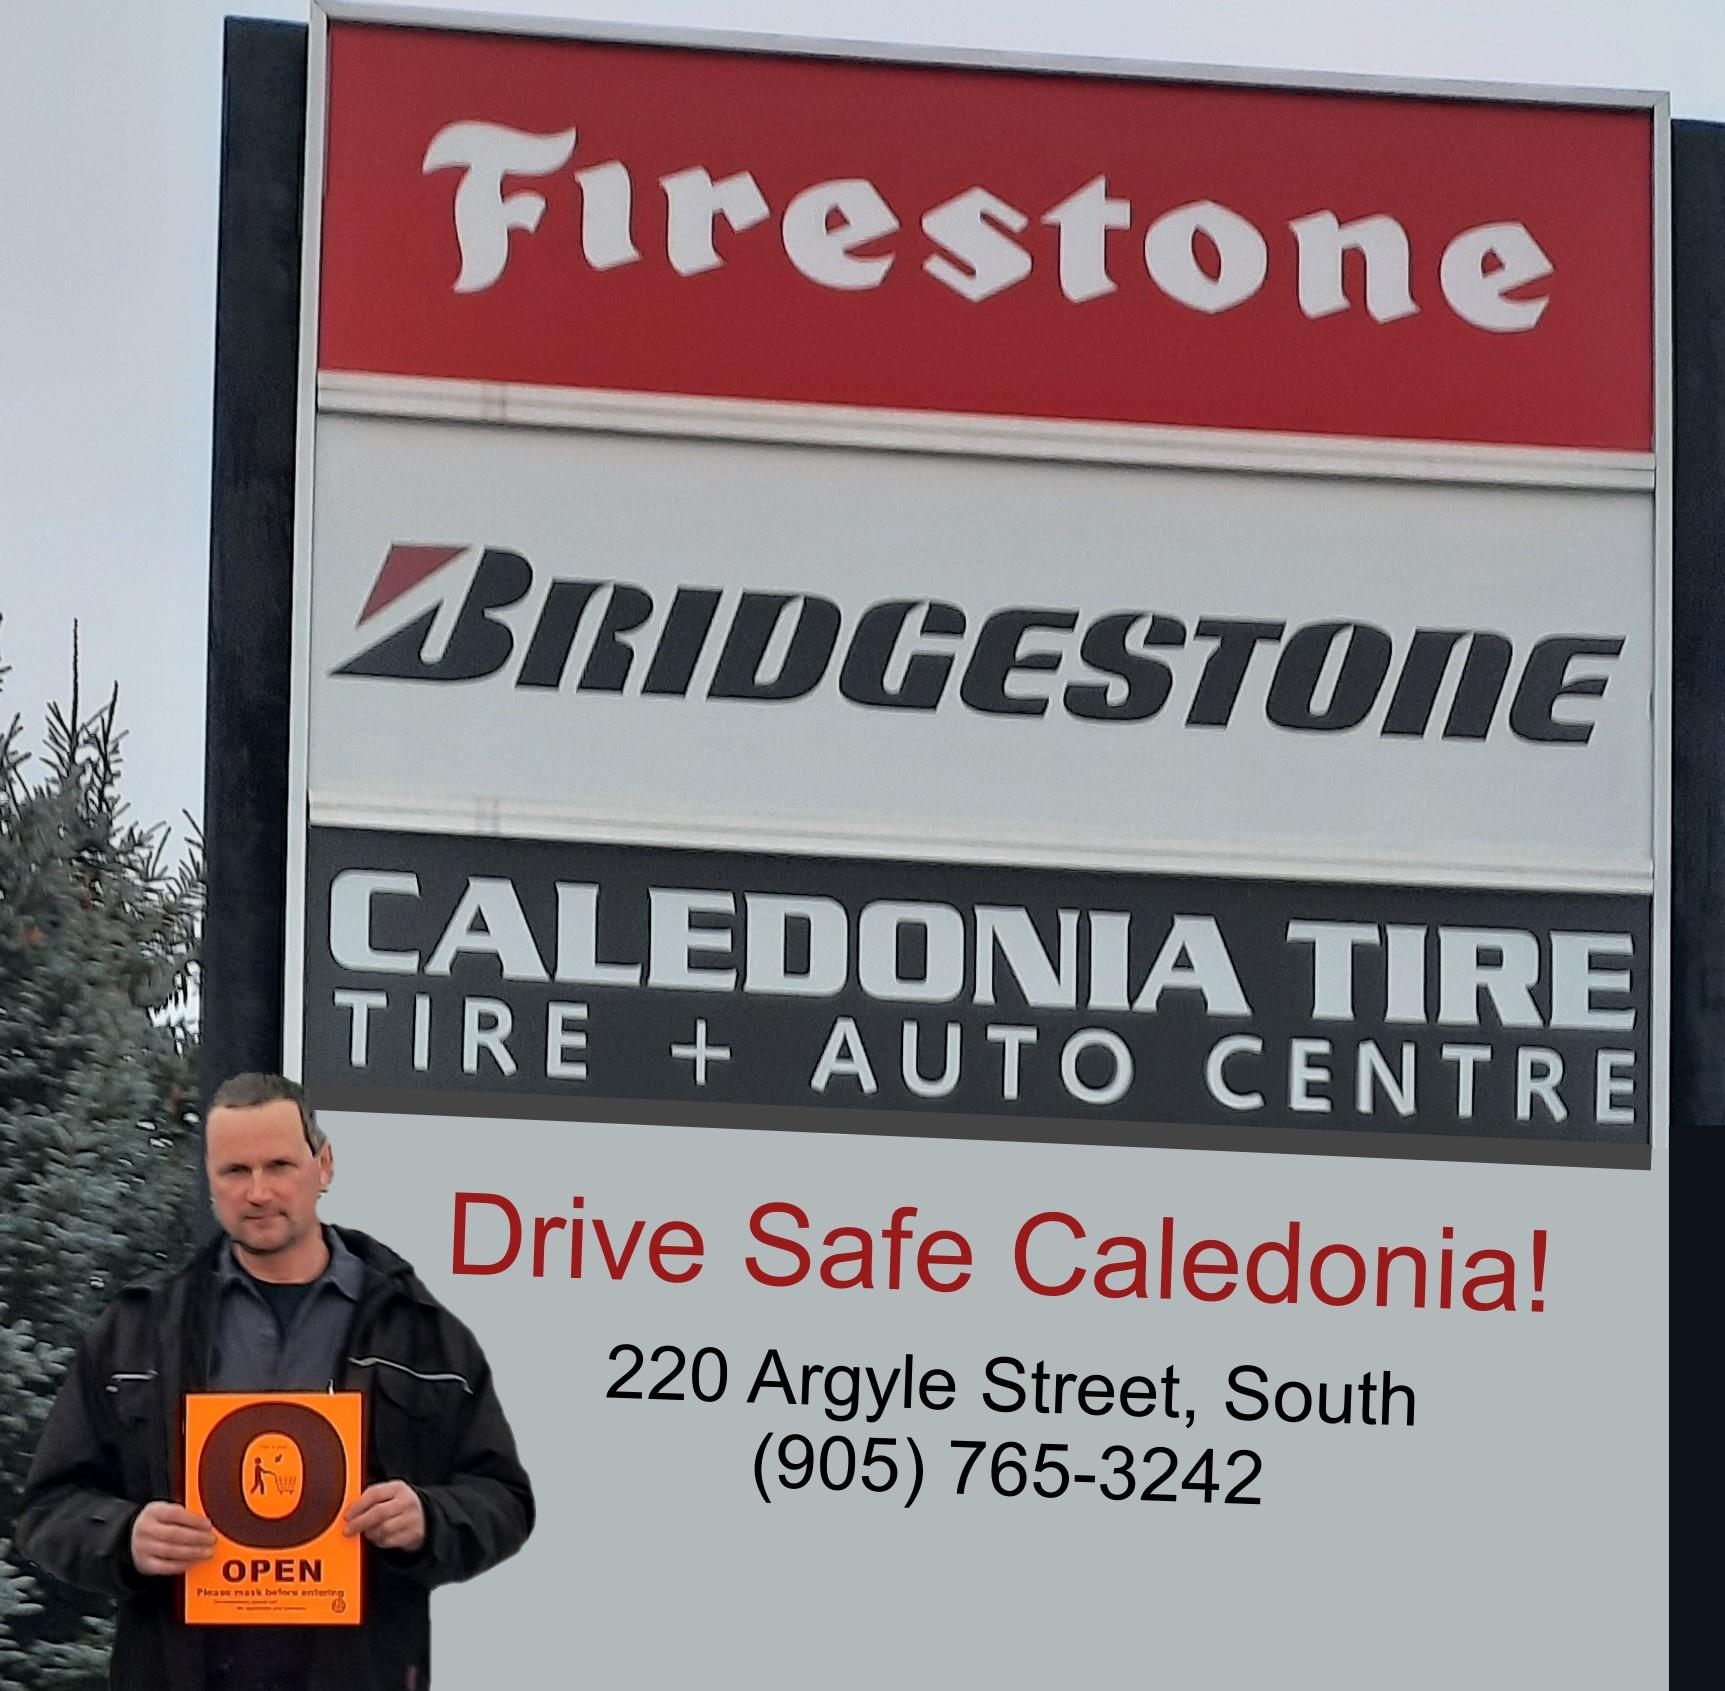 Caledonia Tire & Automotive